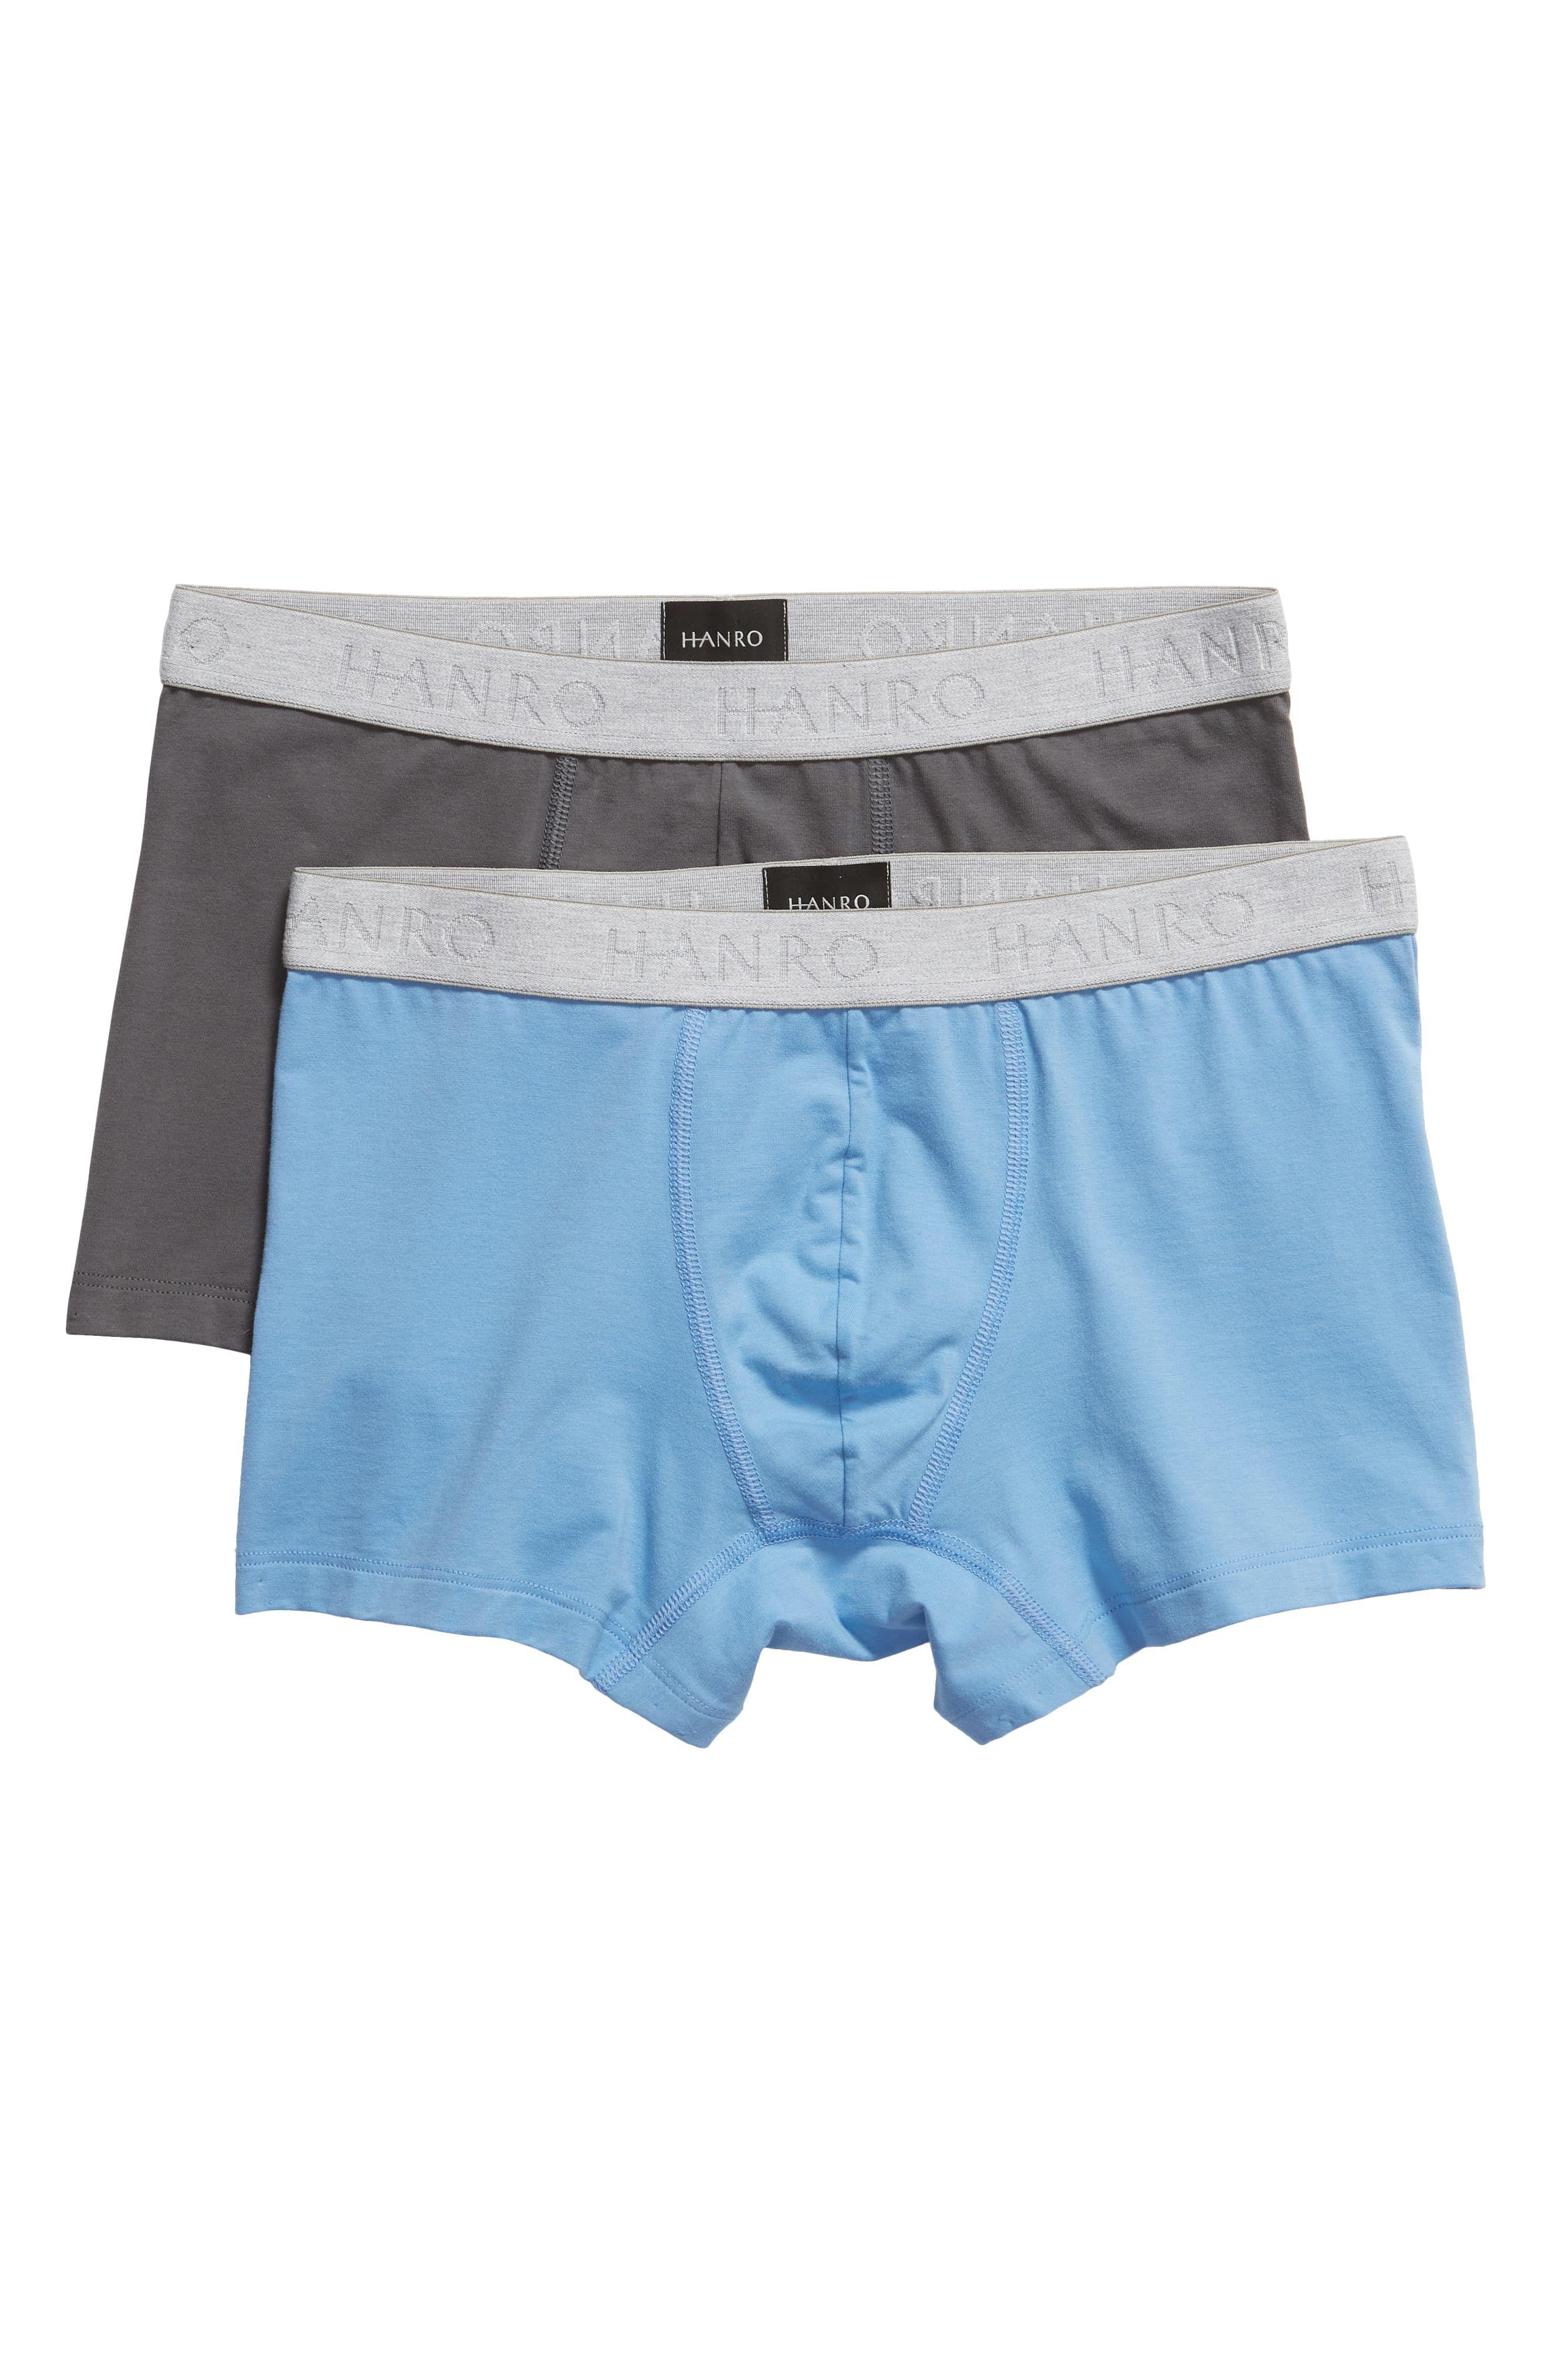 DKNY Mens City Scape Hip Trunk DKNY Men/'s Underwear